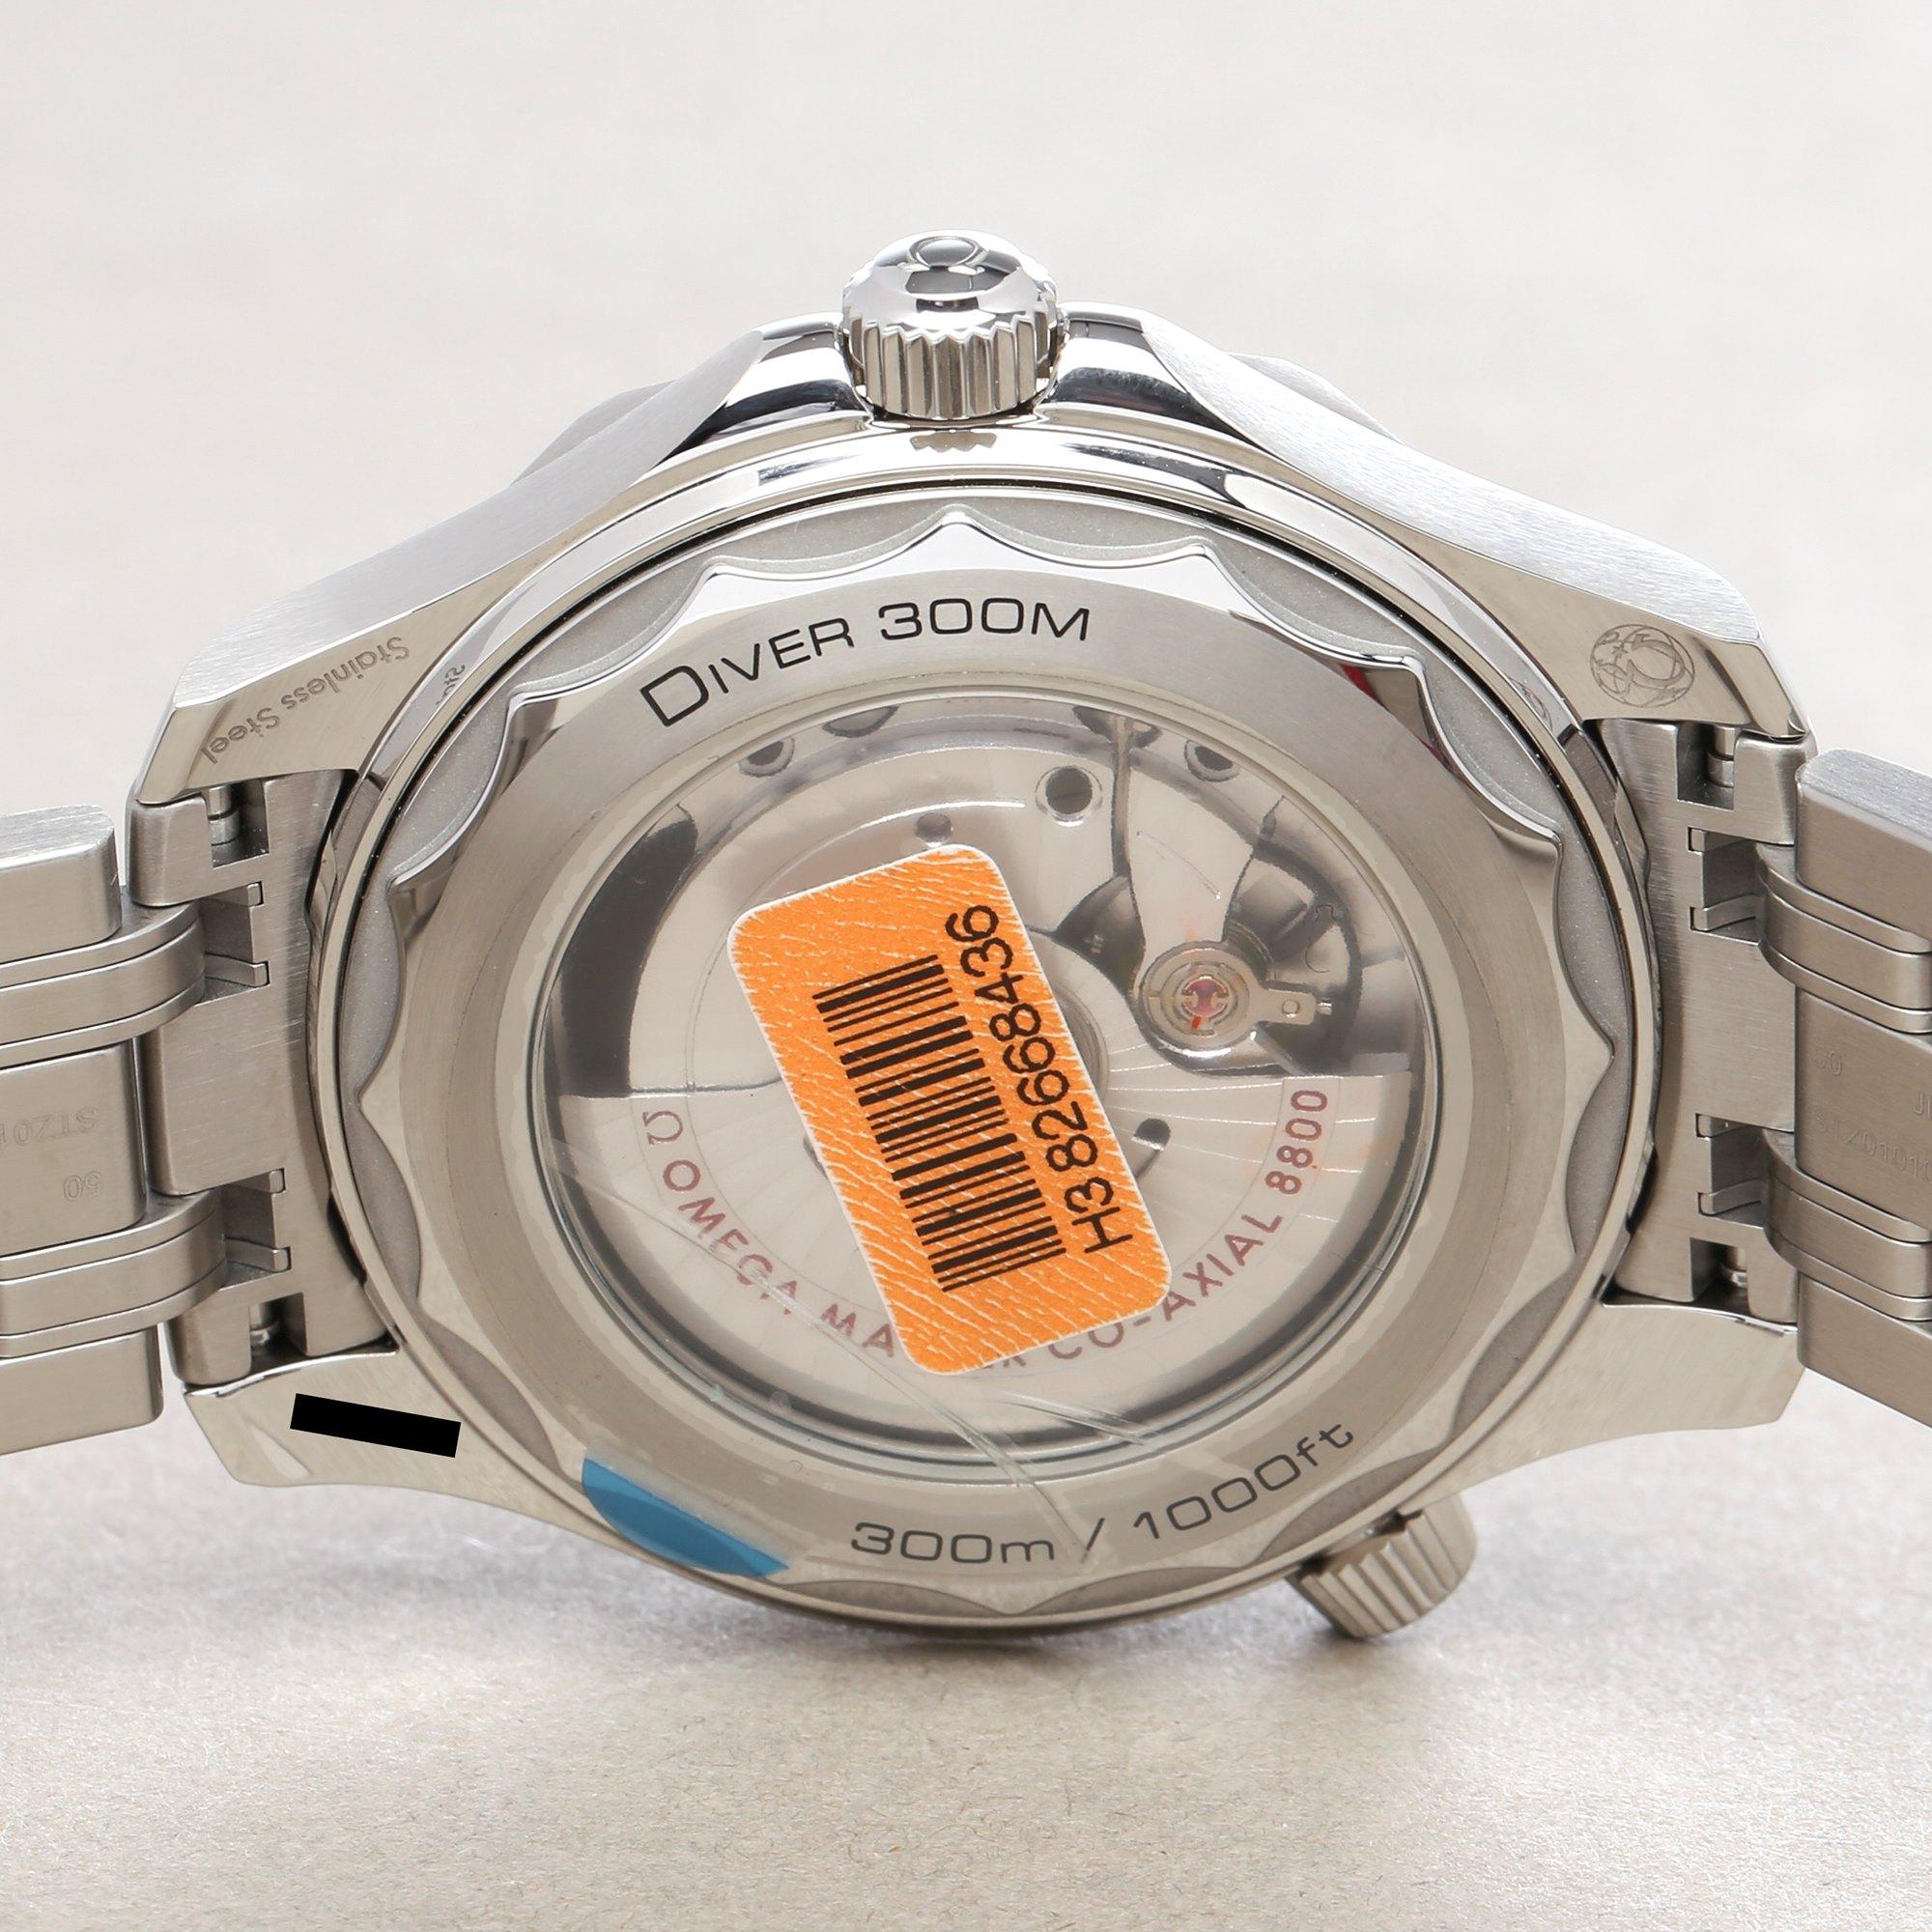 Omega Seamaster Stainless Steel 210.30.42.20.06.001